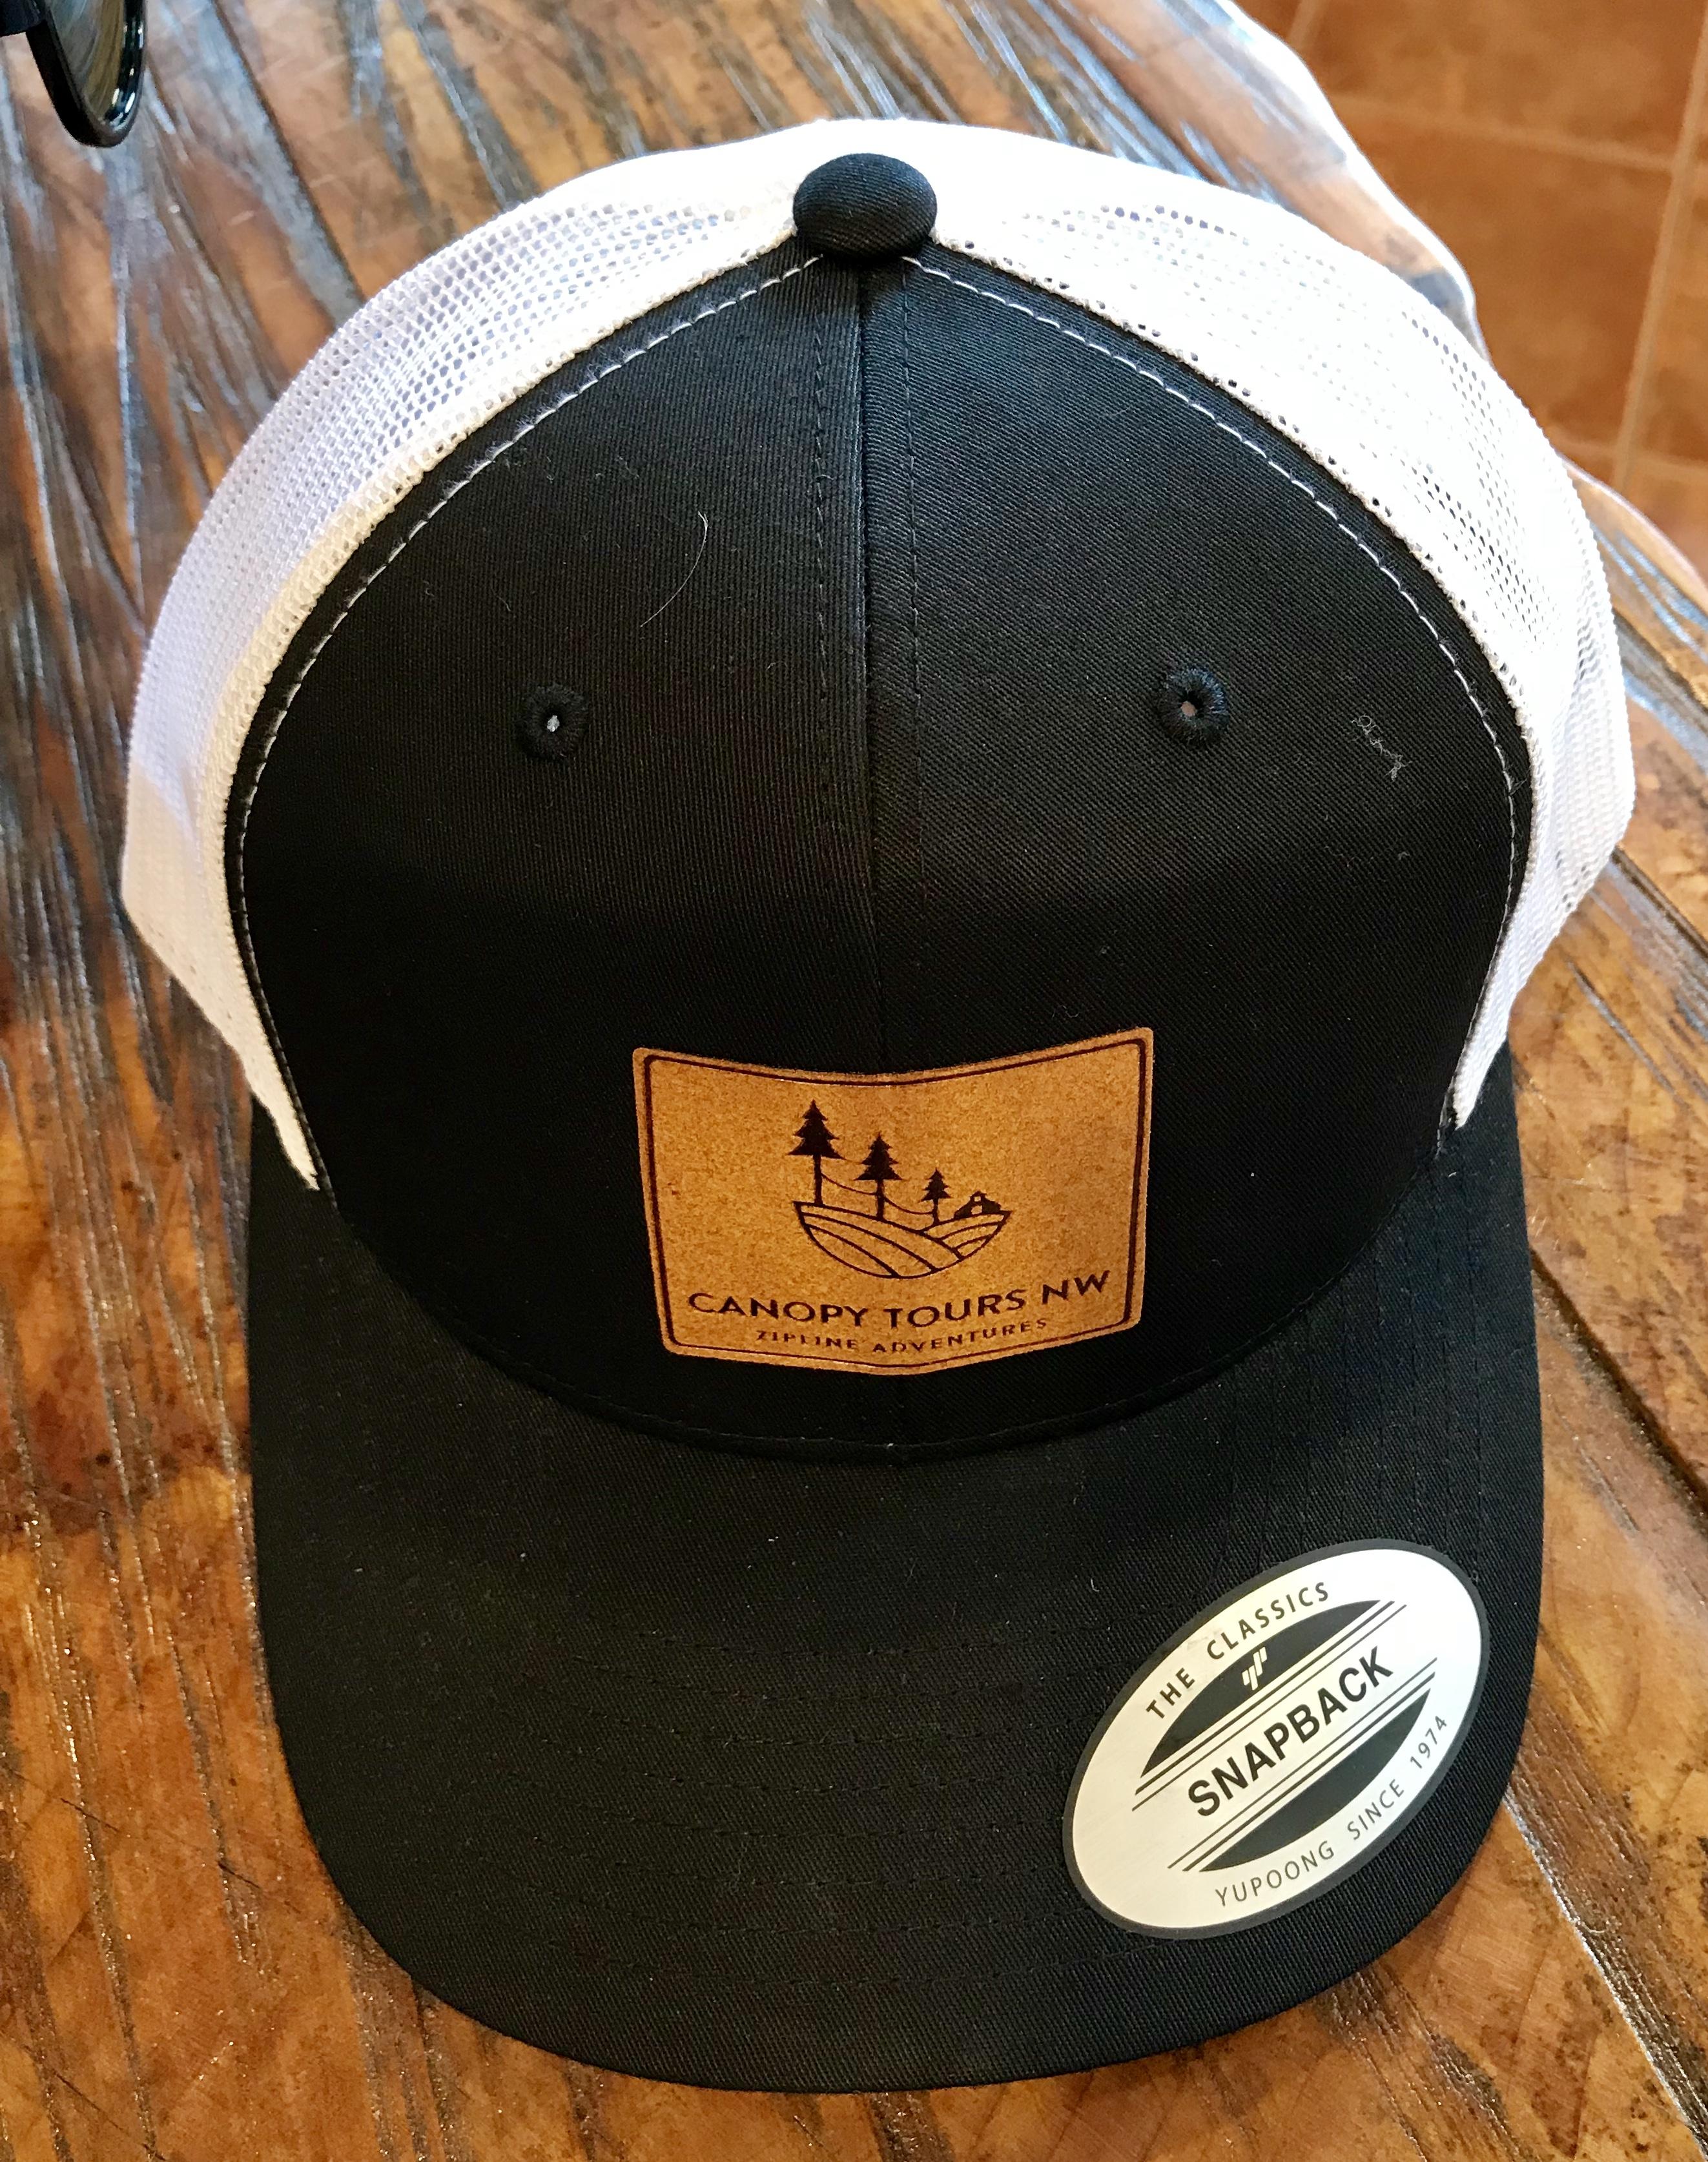 CTNW Hats - CANOPY TOURS NWCANOPY TOURS NW 0e6e6c71f58